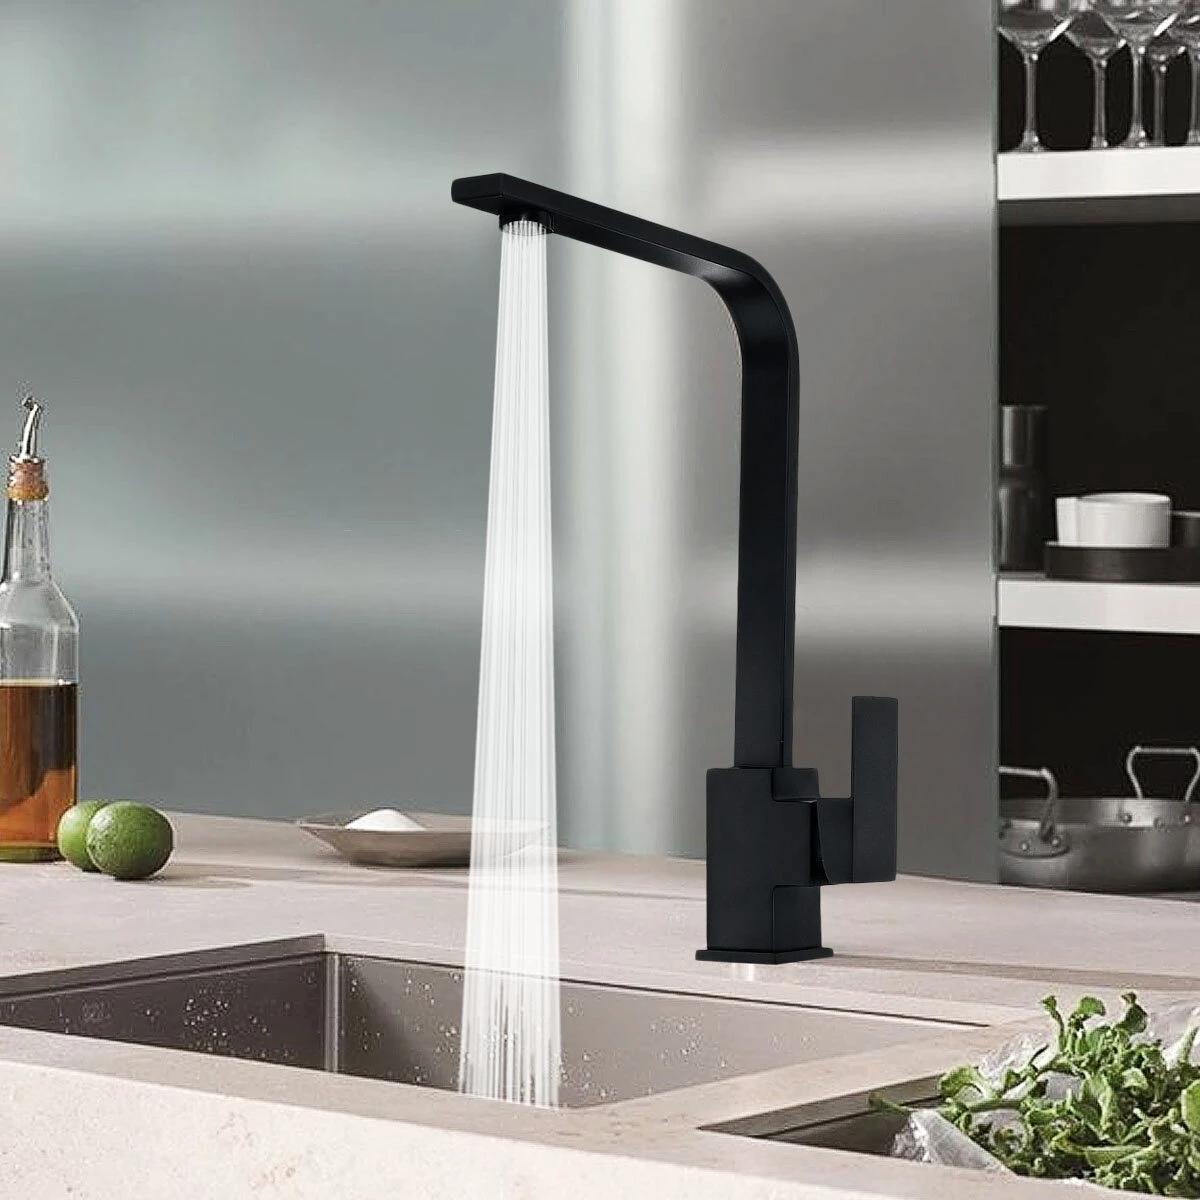 2021 Modern Black Kitchen Sink Taps Mixer Tap Single Lever Basin Brass Mono Faucet From Lightingledworld 42 21 Dhgate Com